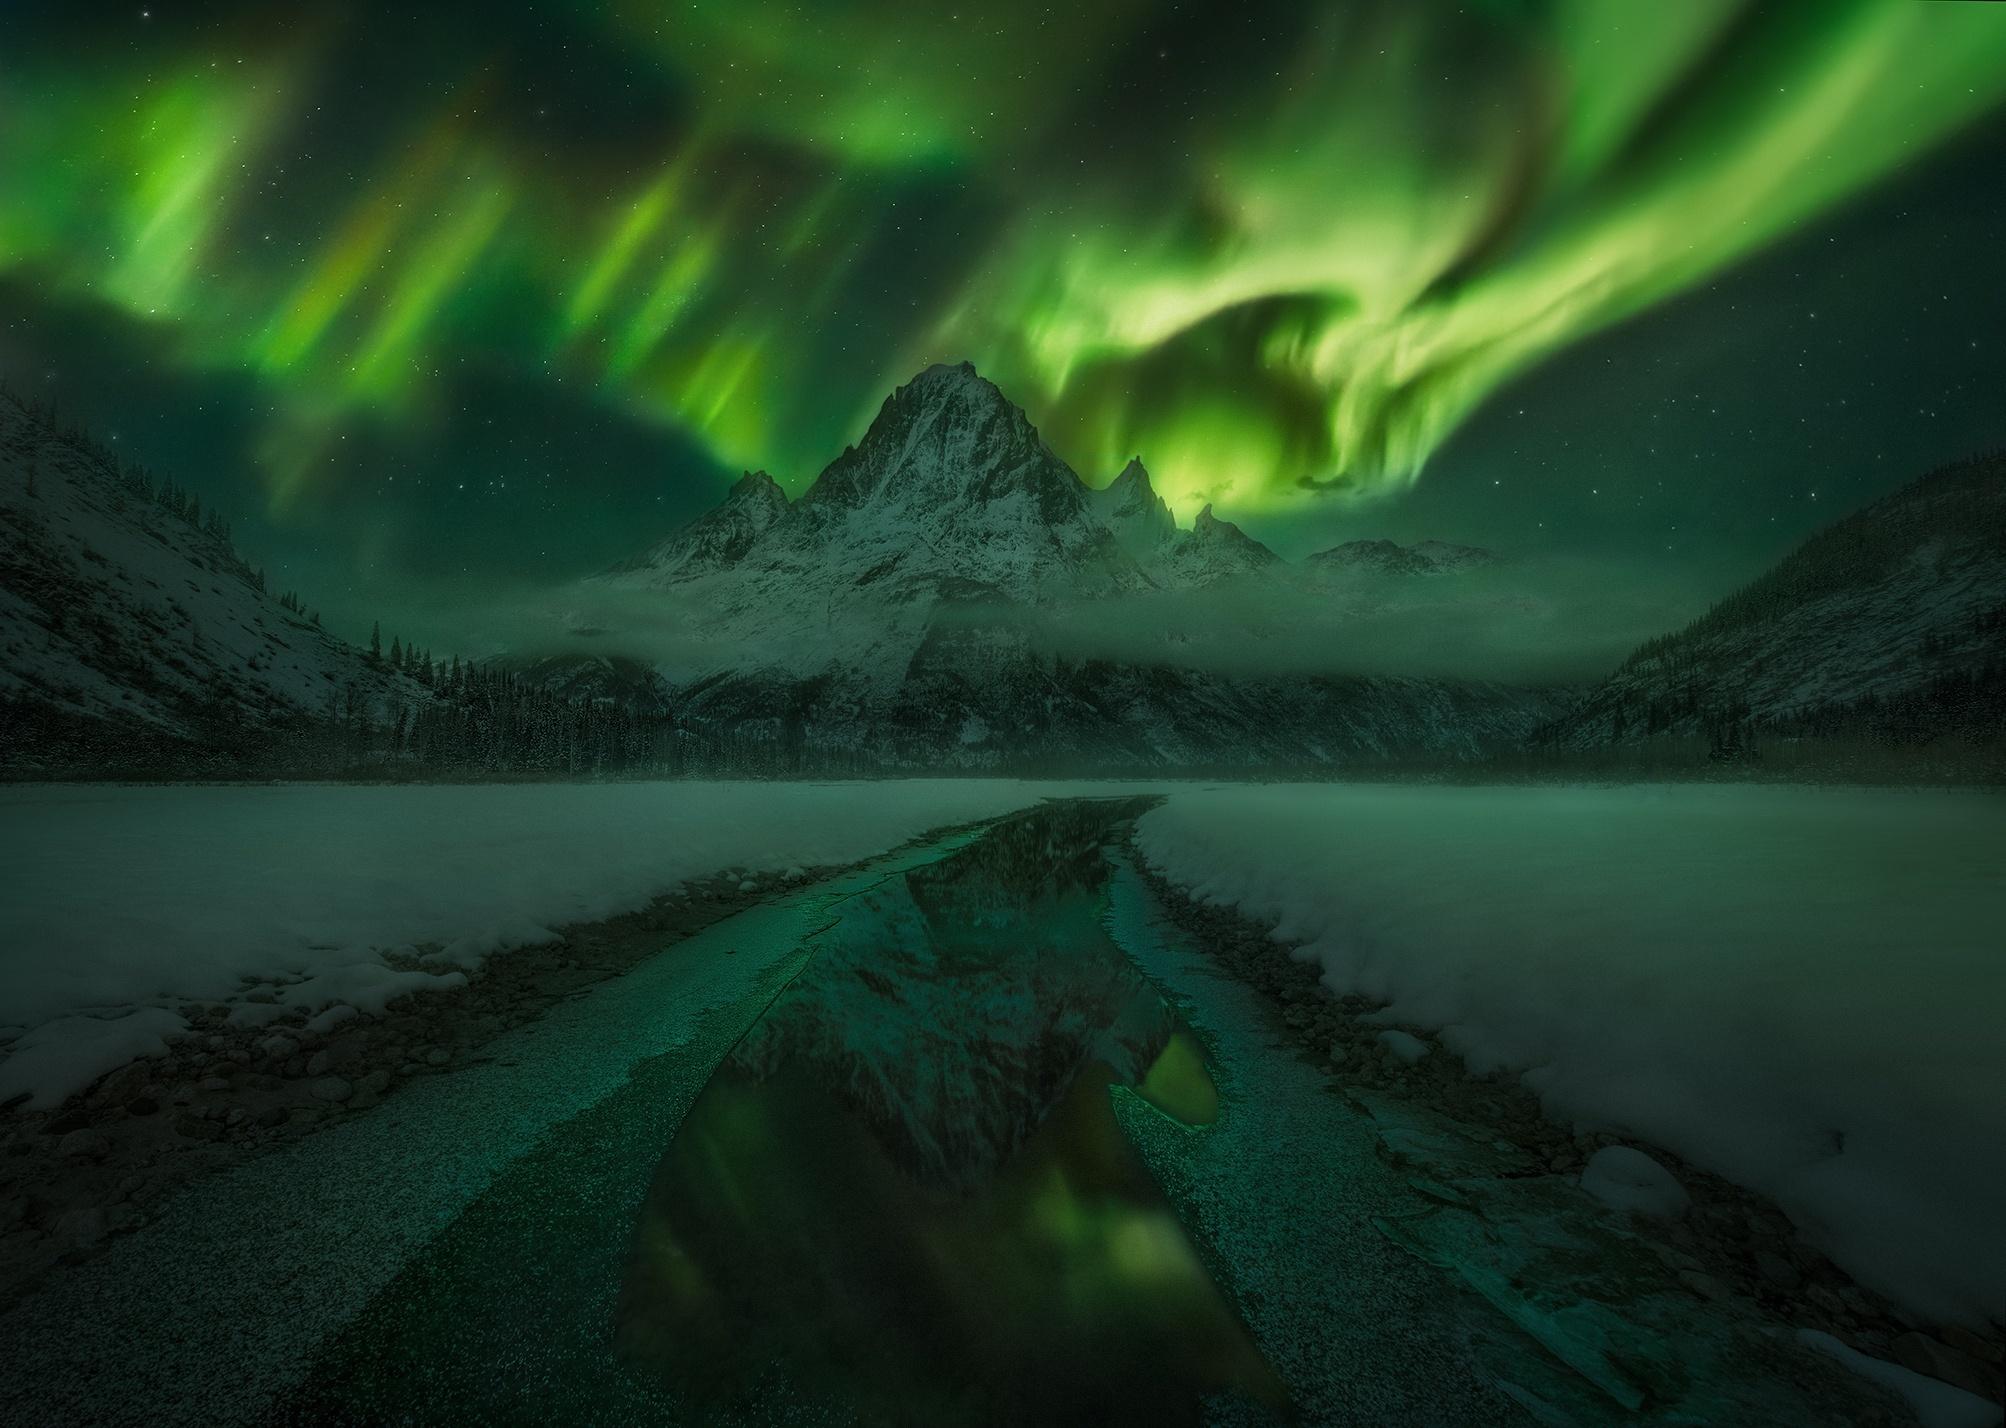 terre nature paysage alaska nature - photo #16